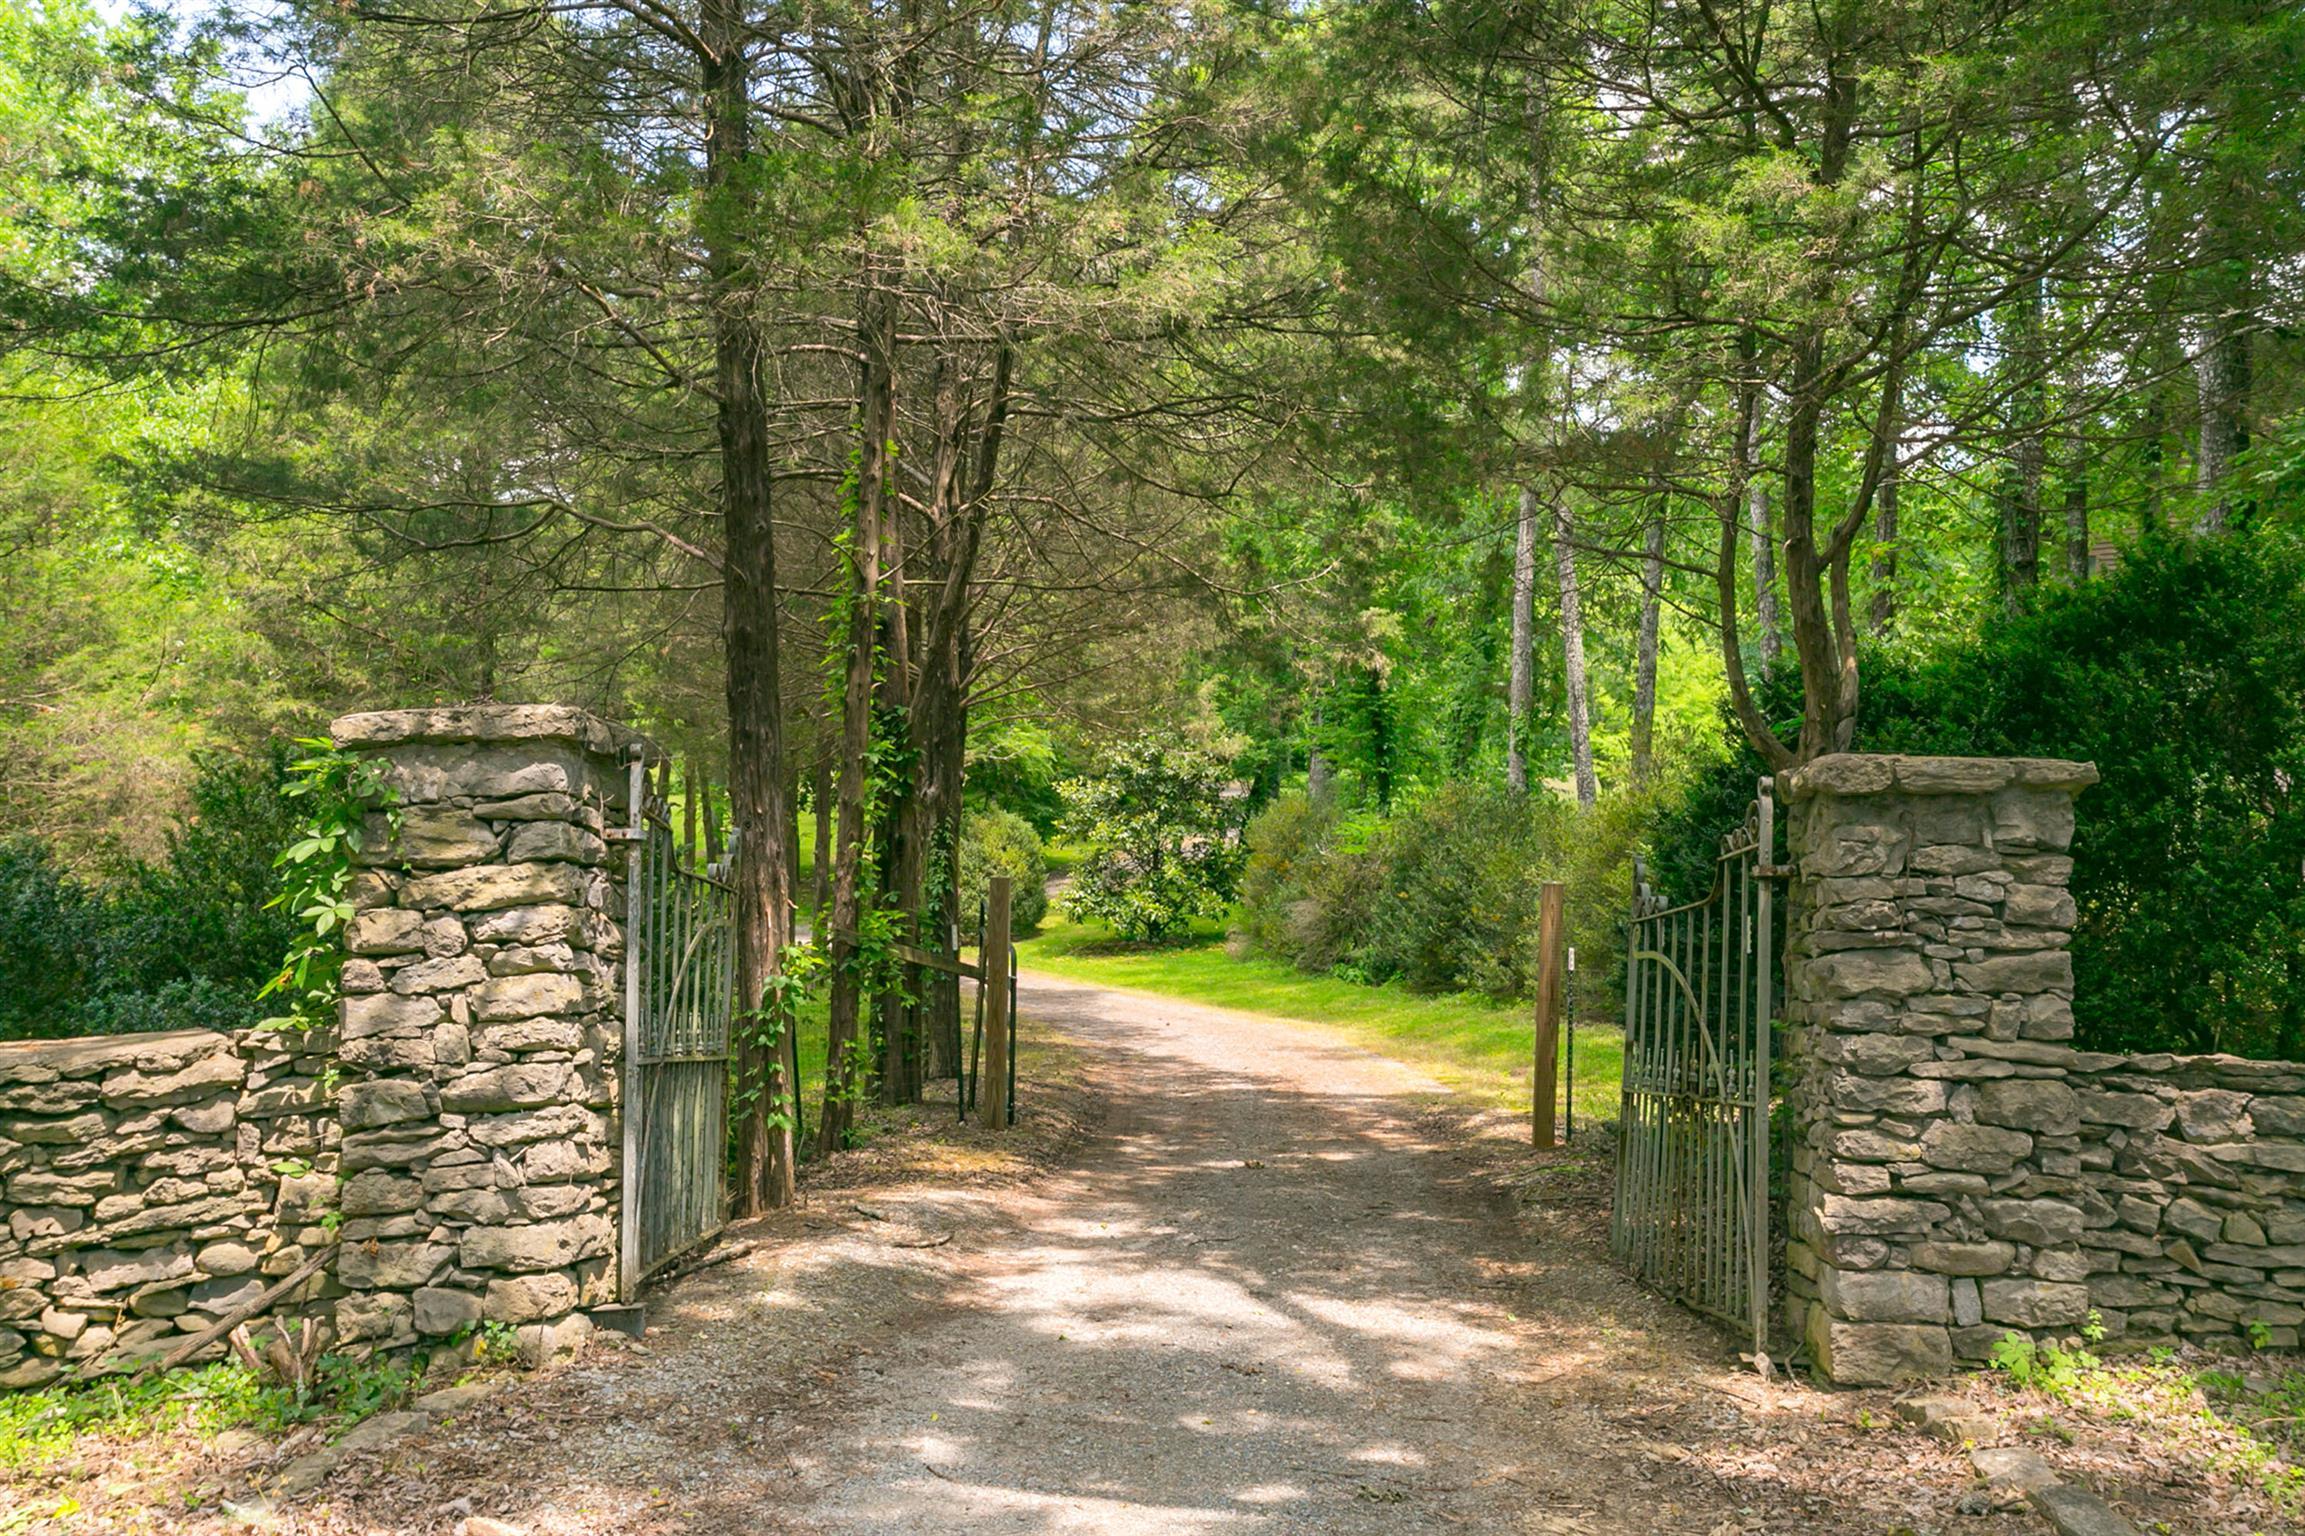 698 Sneed Rd W, Franklin, TN 37069 - Franklin, TN real estate listing